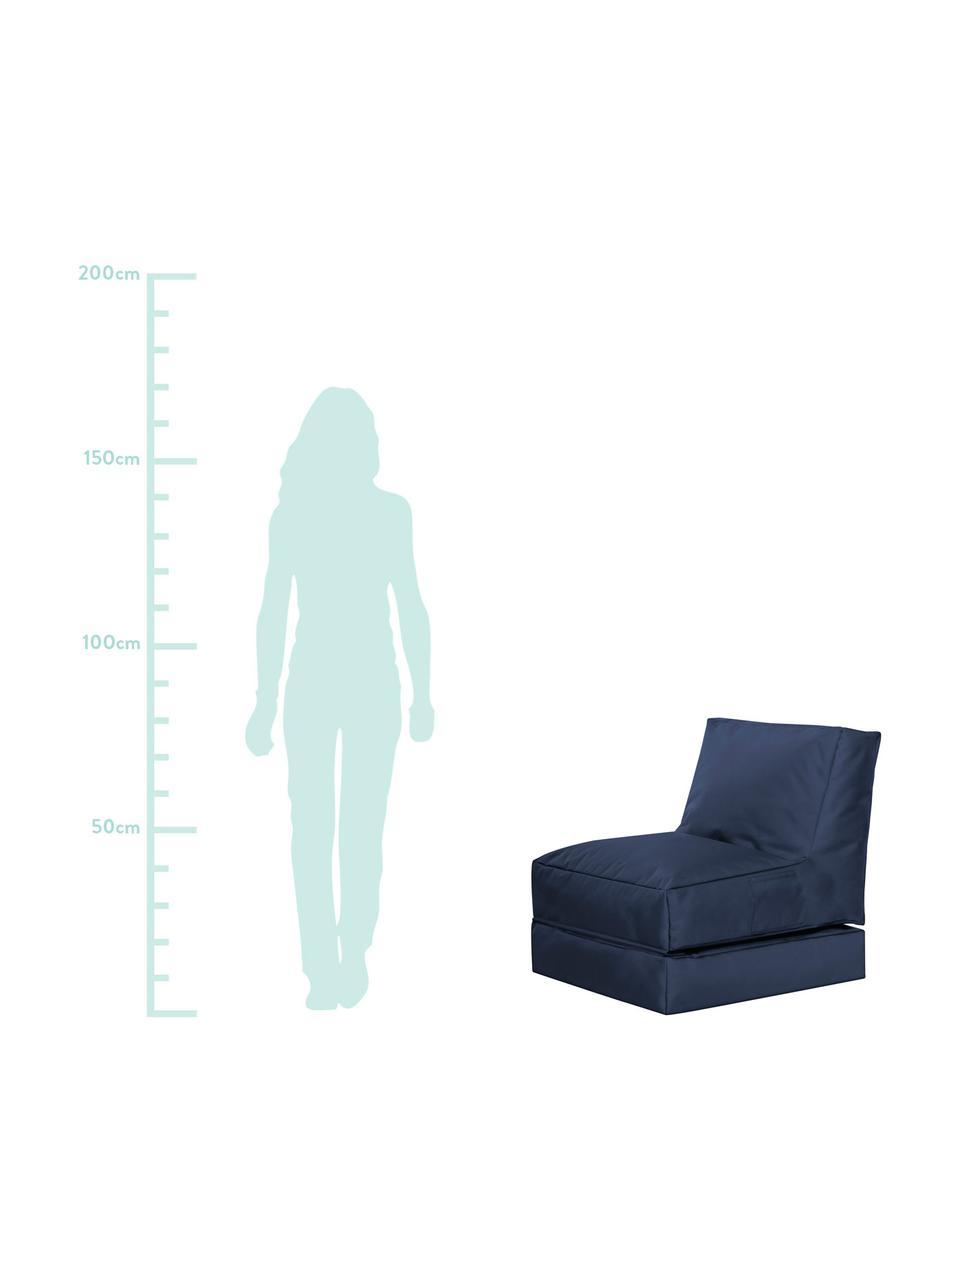 Poltrona letto da giardino Pop Up, Rivestimento: 100% poliestere All'inter, Blue jeans, Larg. 70 x Prof. 90 cm